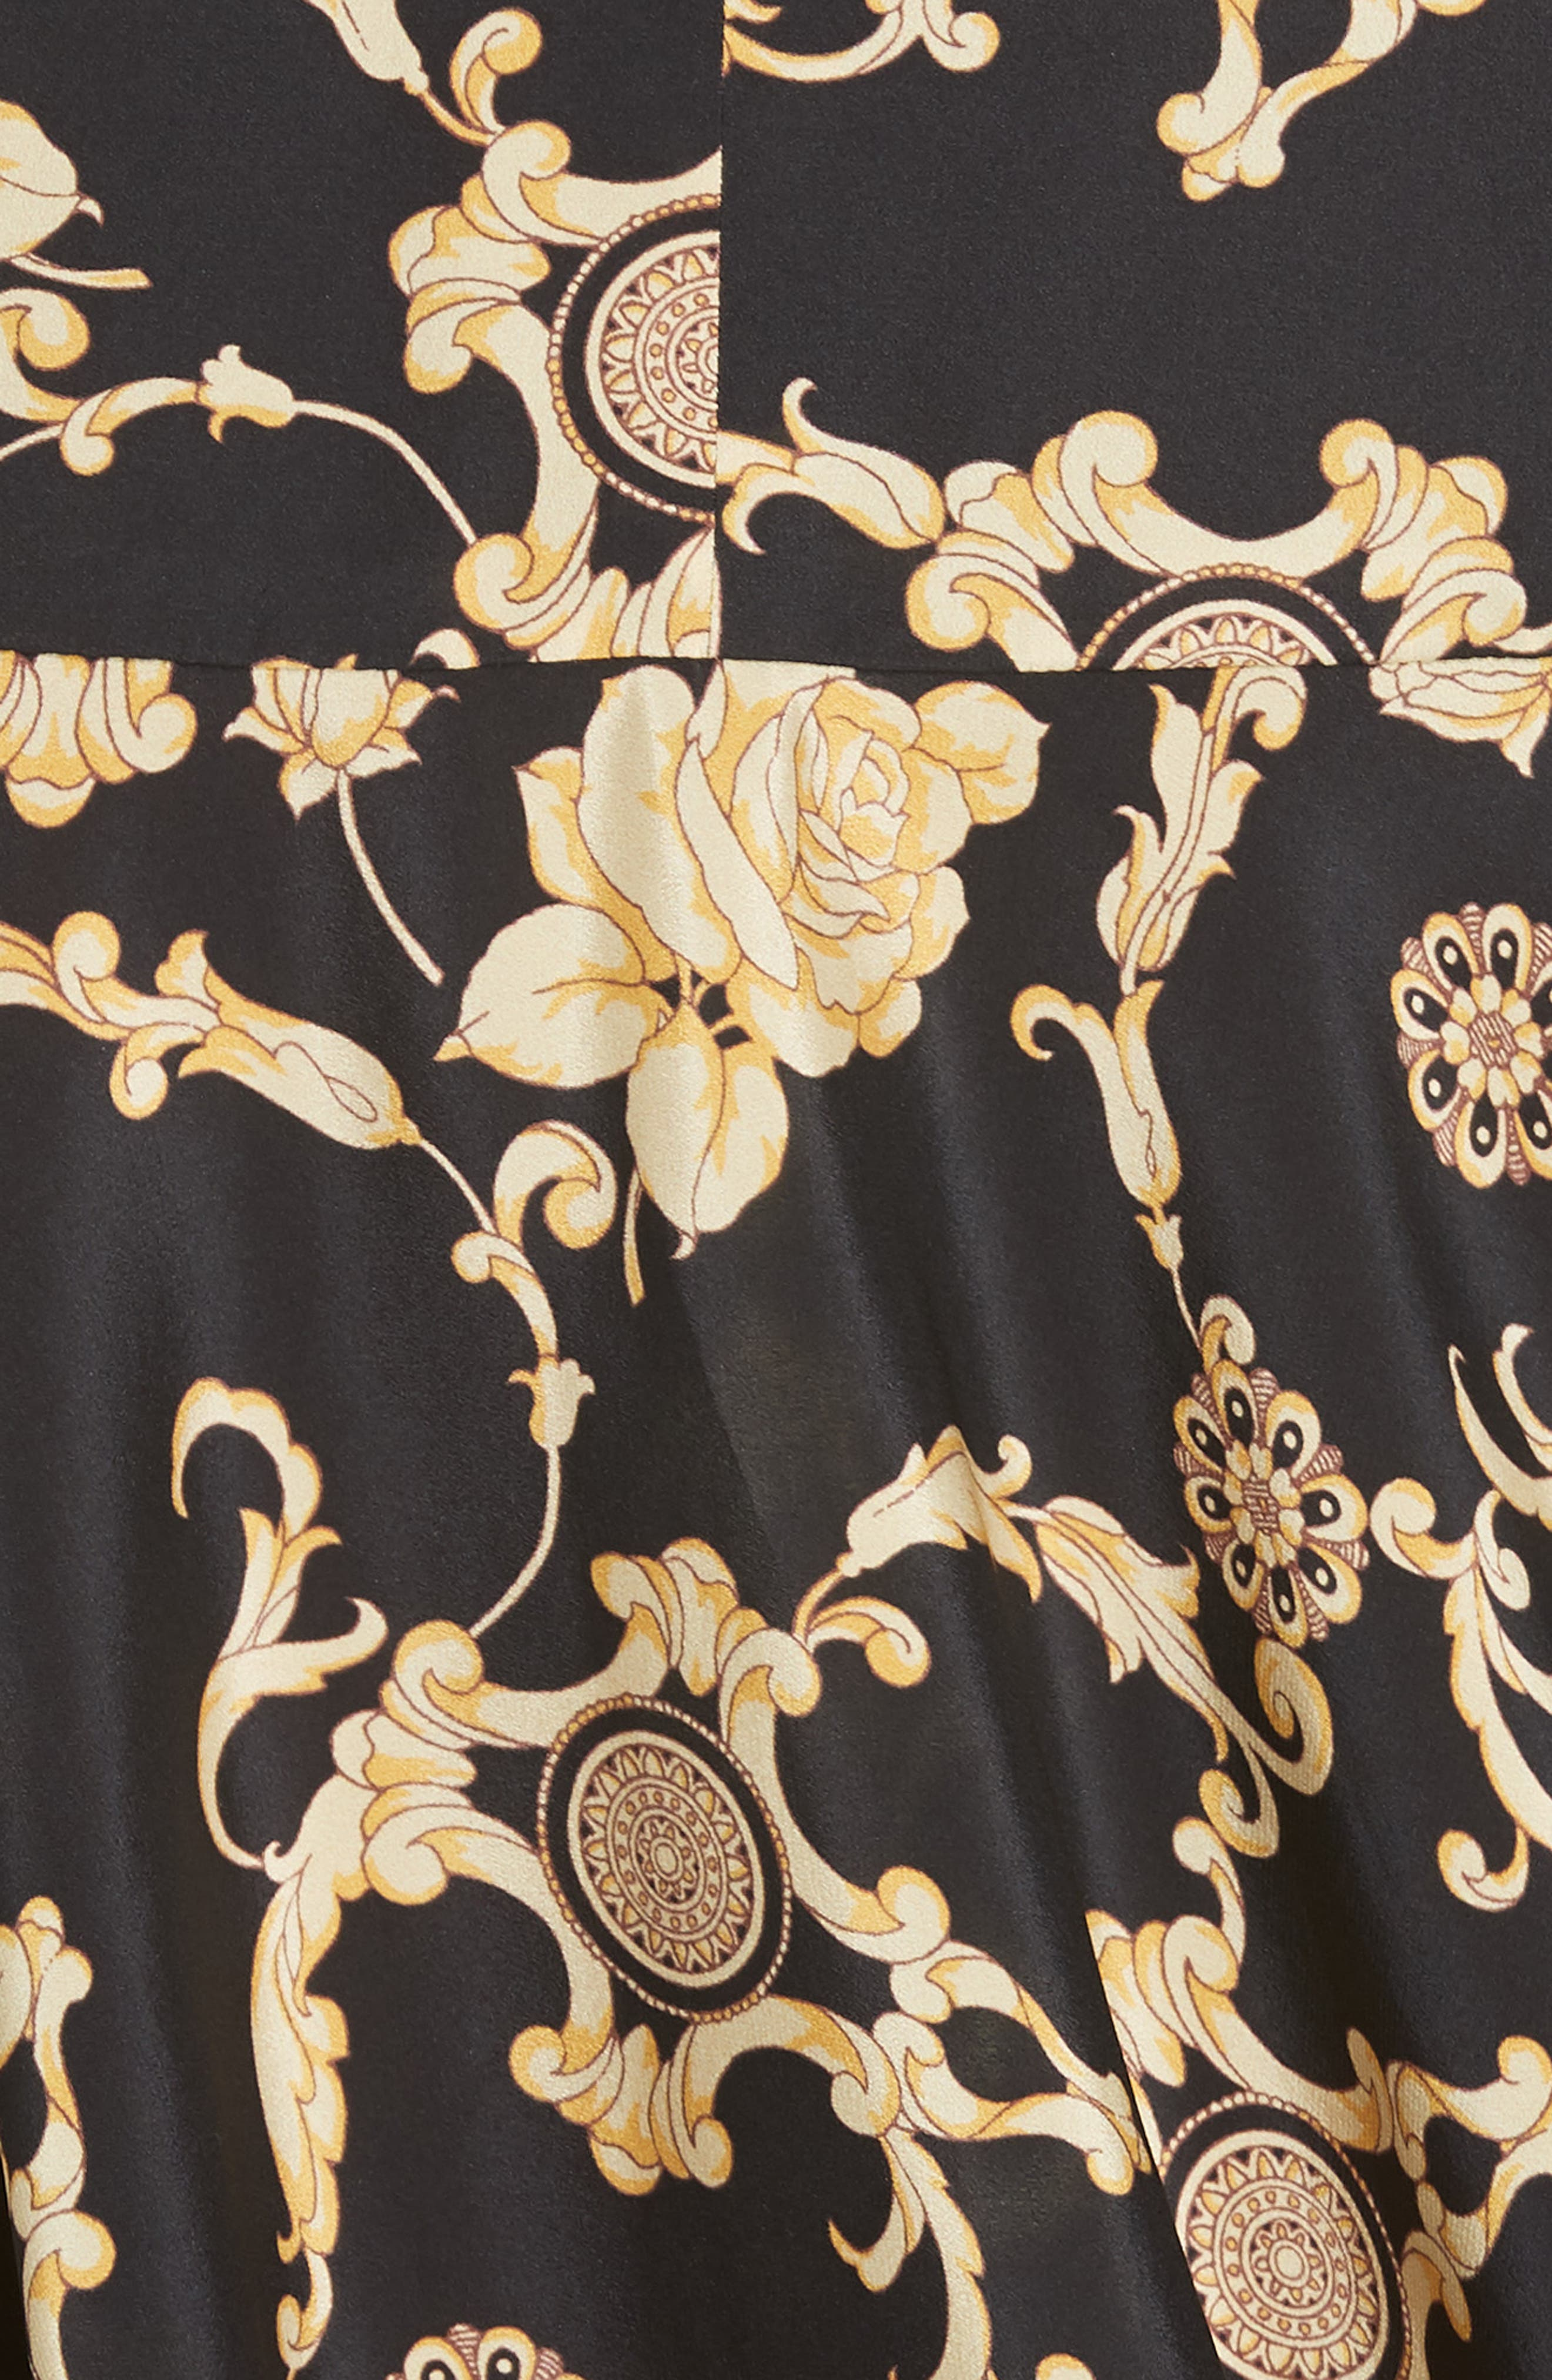 Annika Floral Print Strapless Stretch Silk Dress,                             Alternate thumbnail 5, color,                             BLACK/ GOLD